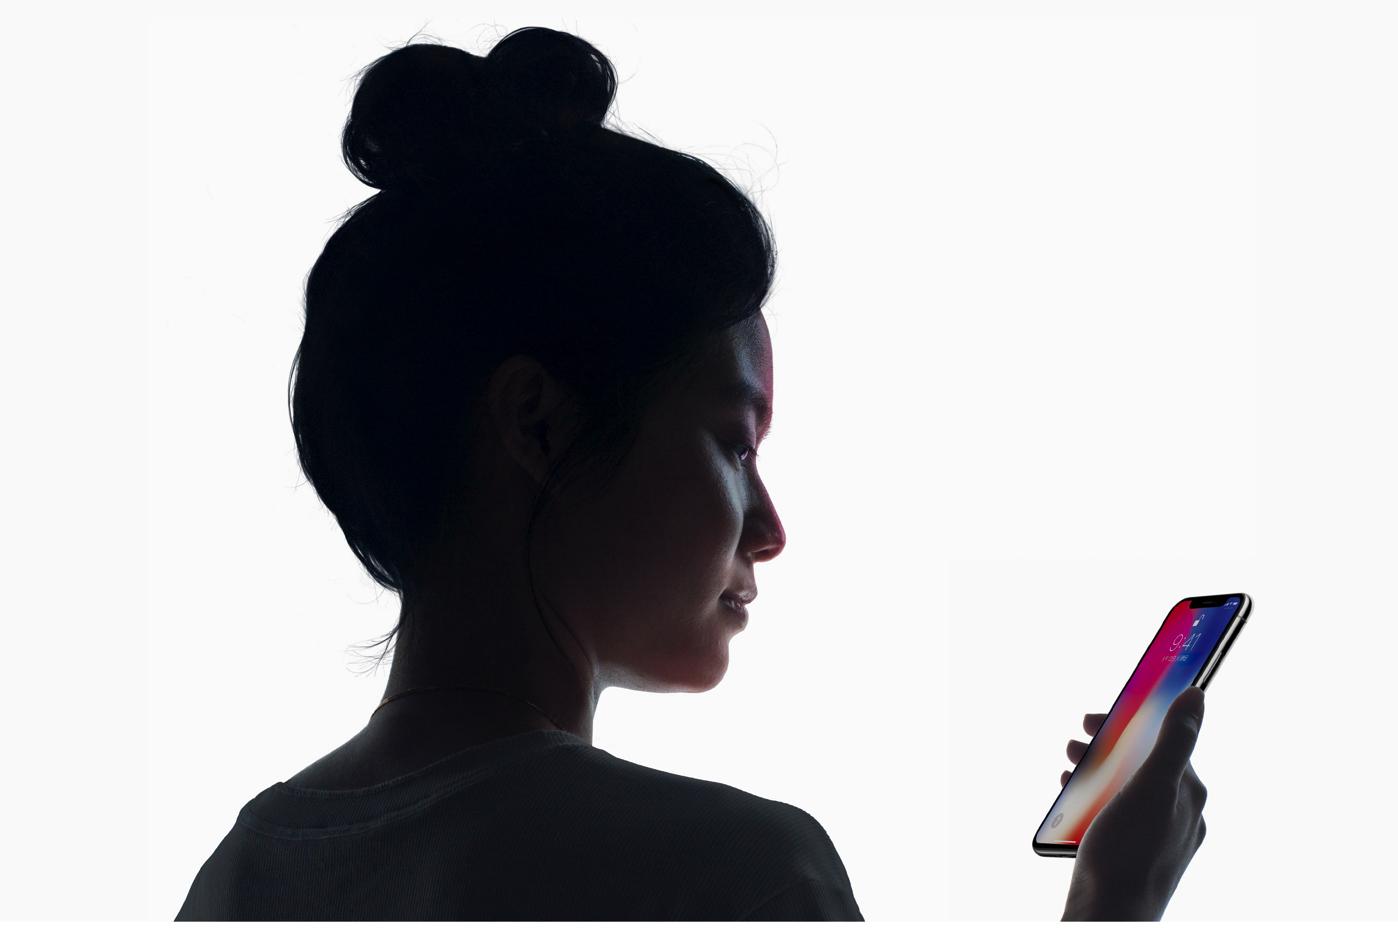 iPhone X-3